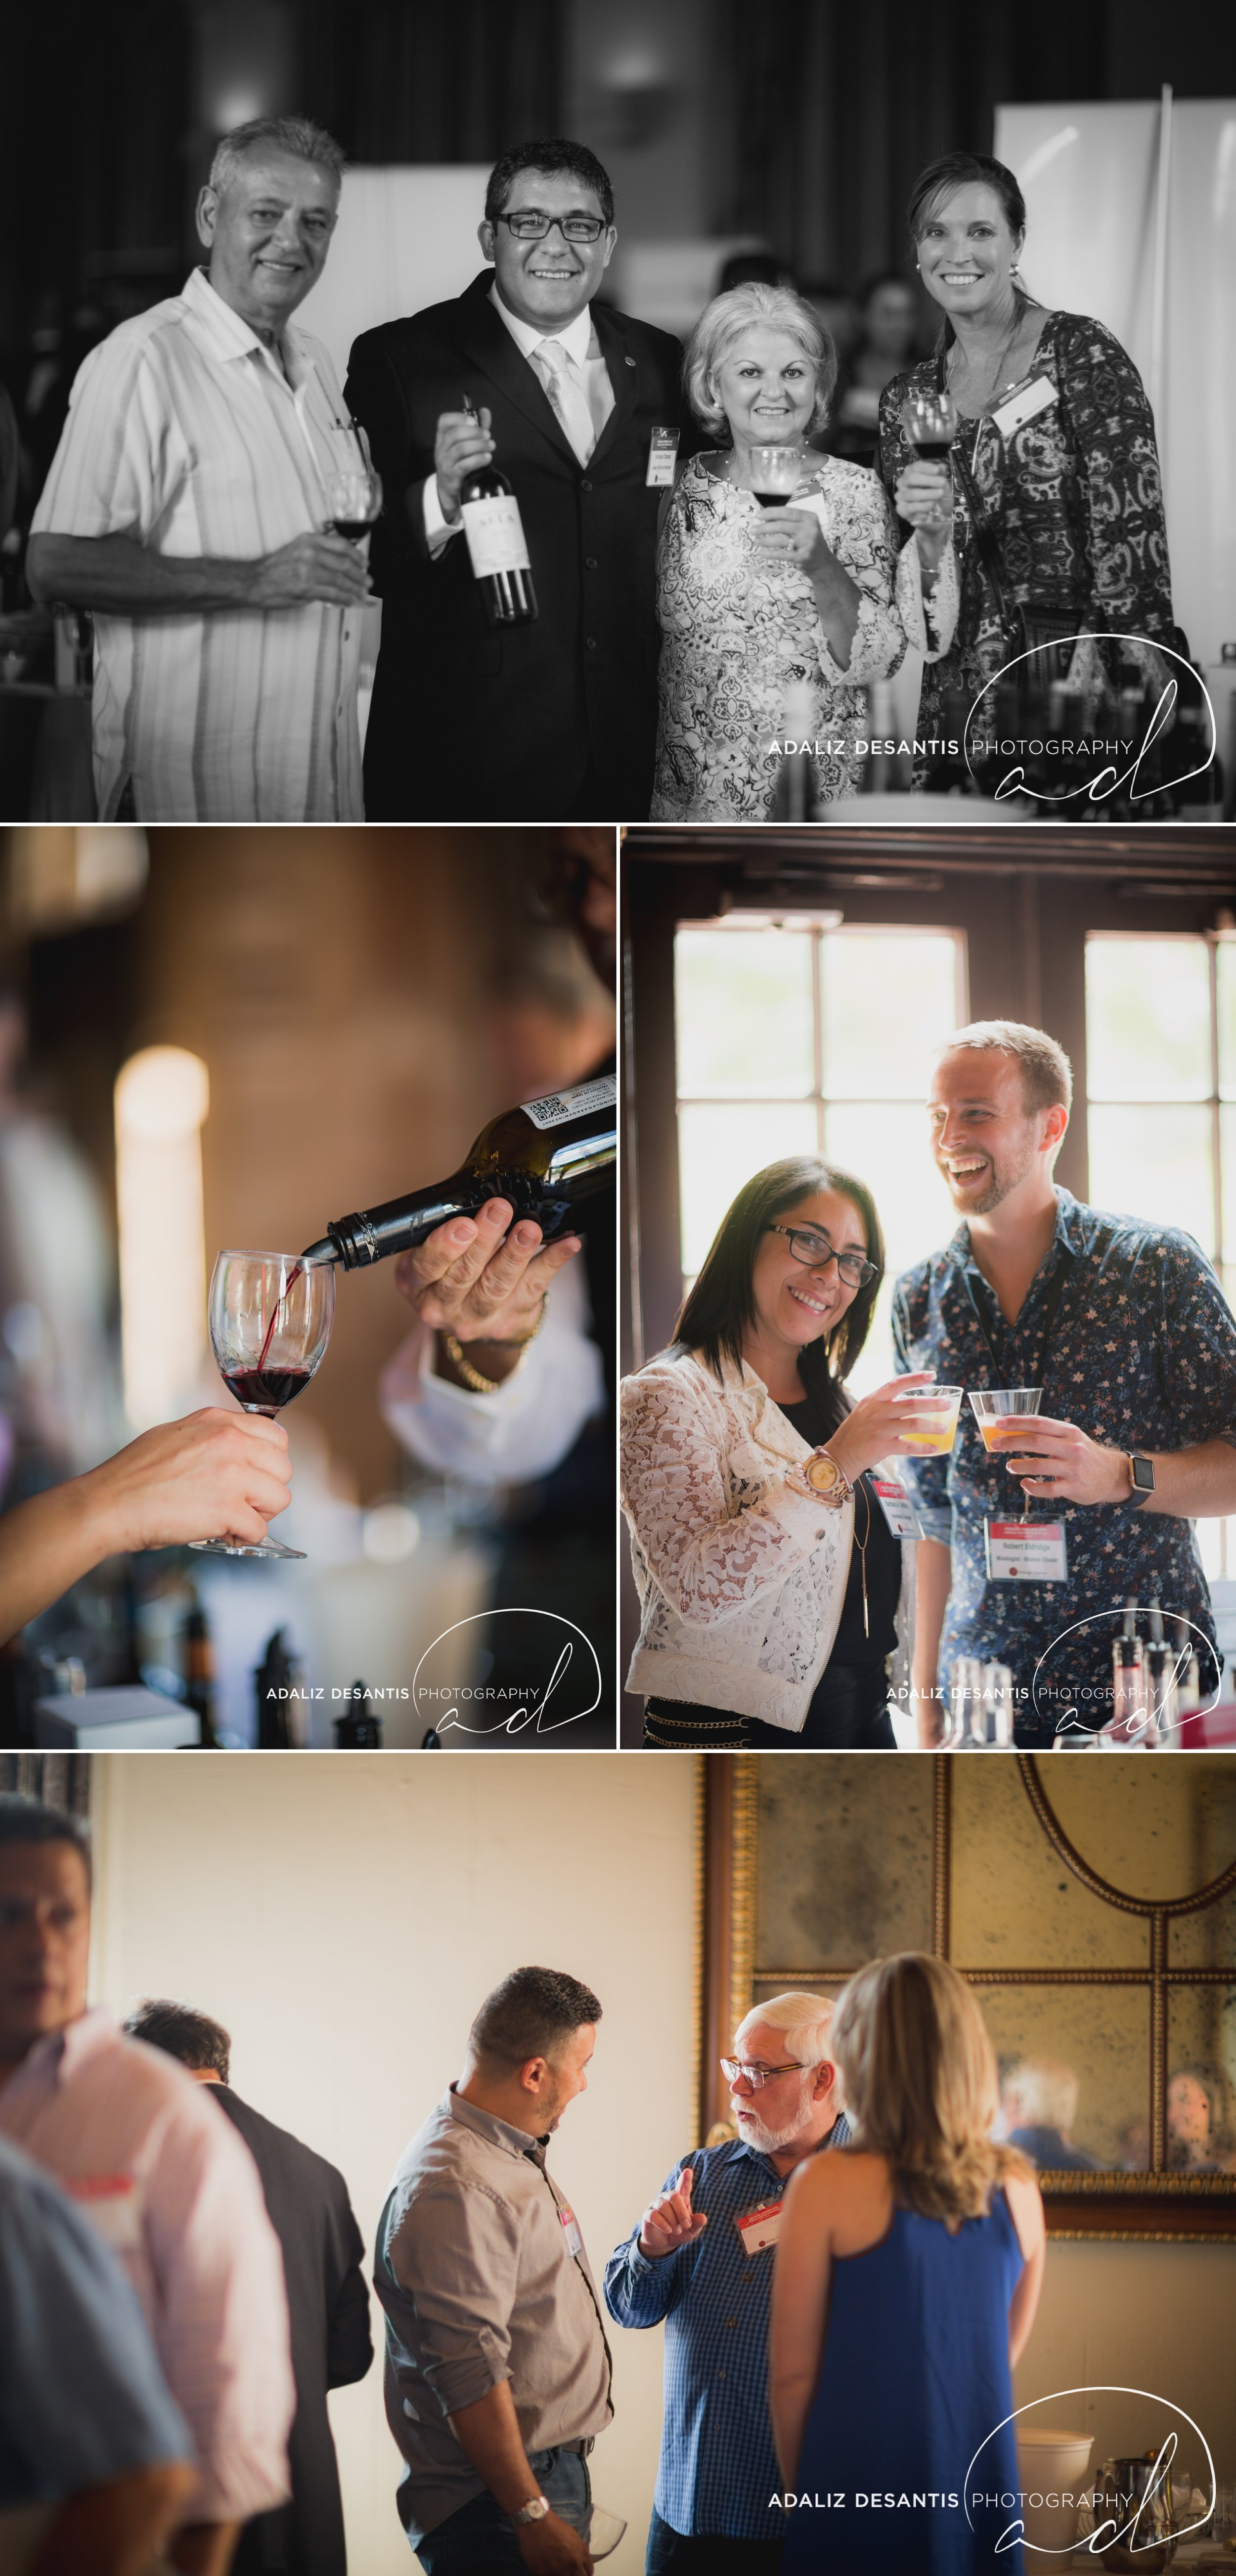 hidalgo imports anniversary wine spirits tasting biltmore hotel coral gables florida miami 10.jpg